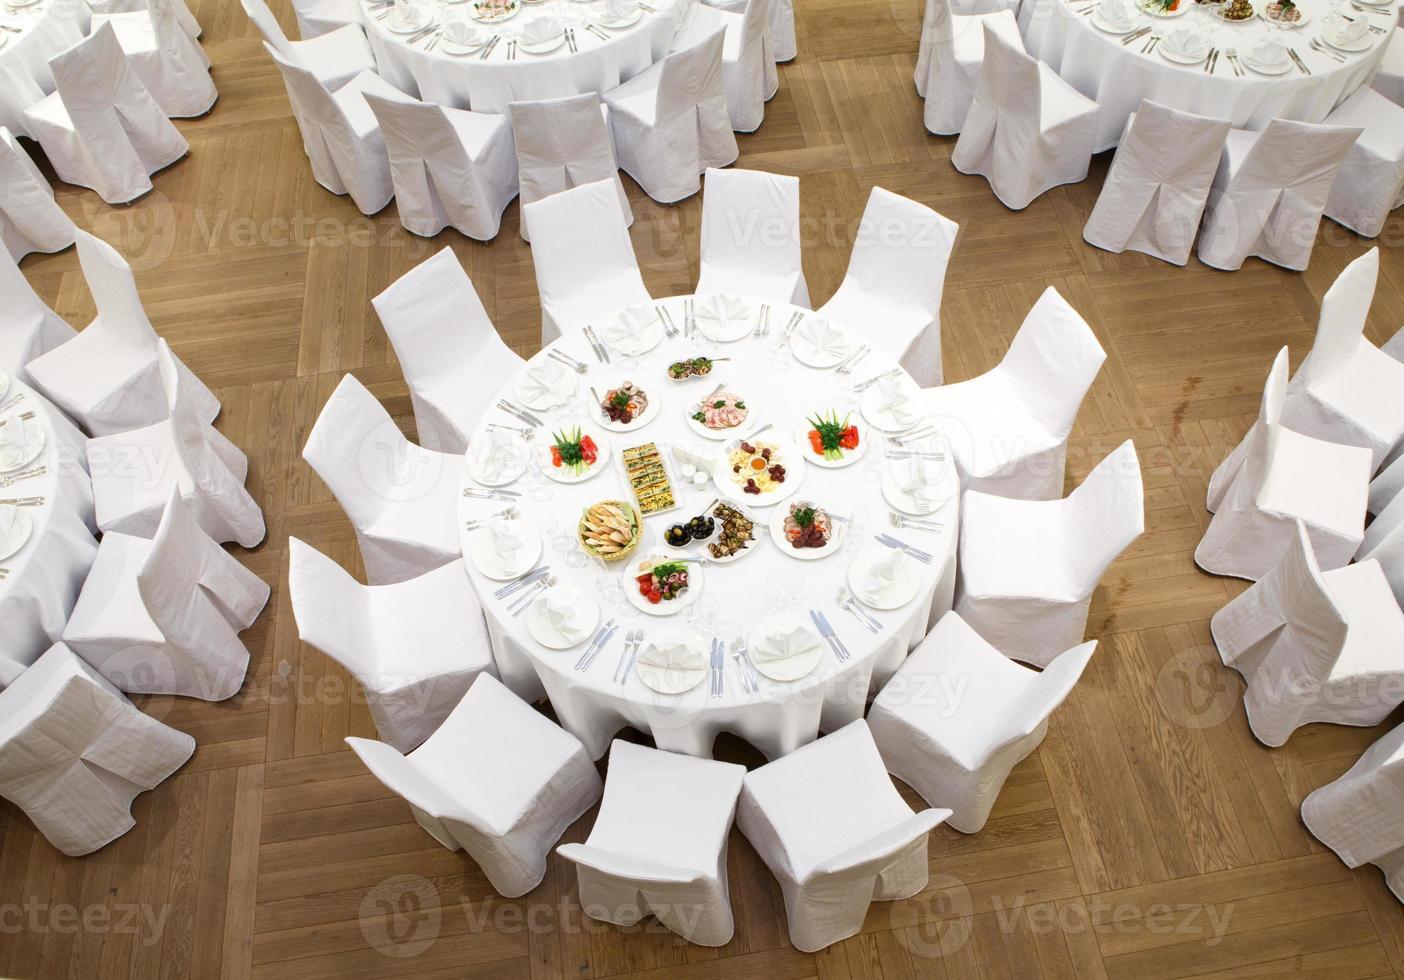 evento lindamente organizado - mesas de banquete servidas foto